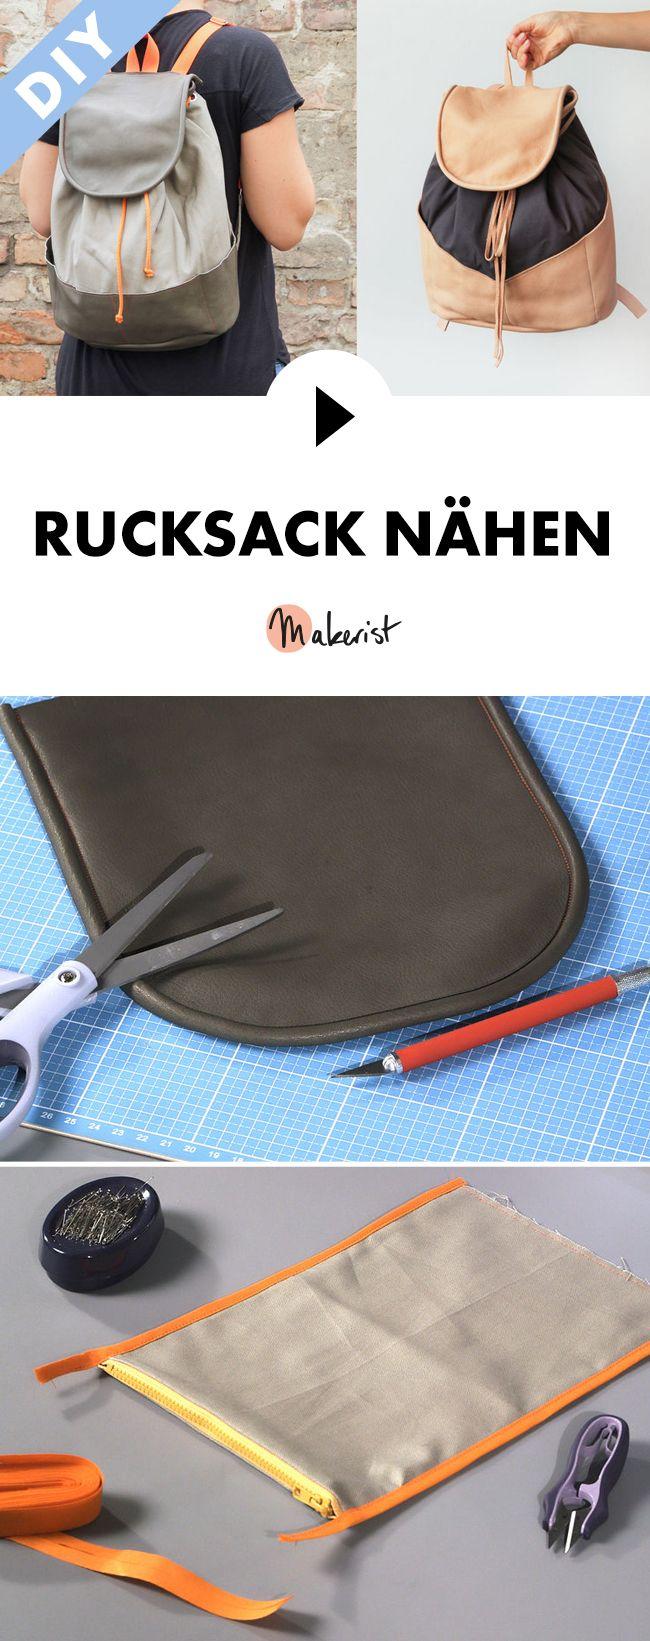 Individuellen Rucksack nähen – Step by Step erklärt im Video-Kurs via Makerist…